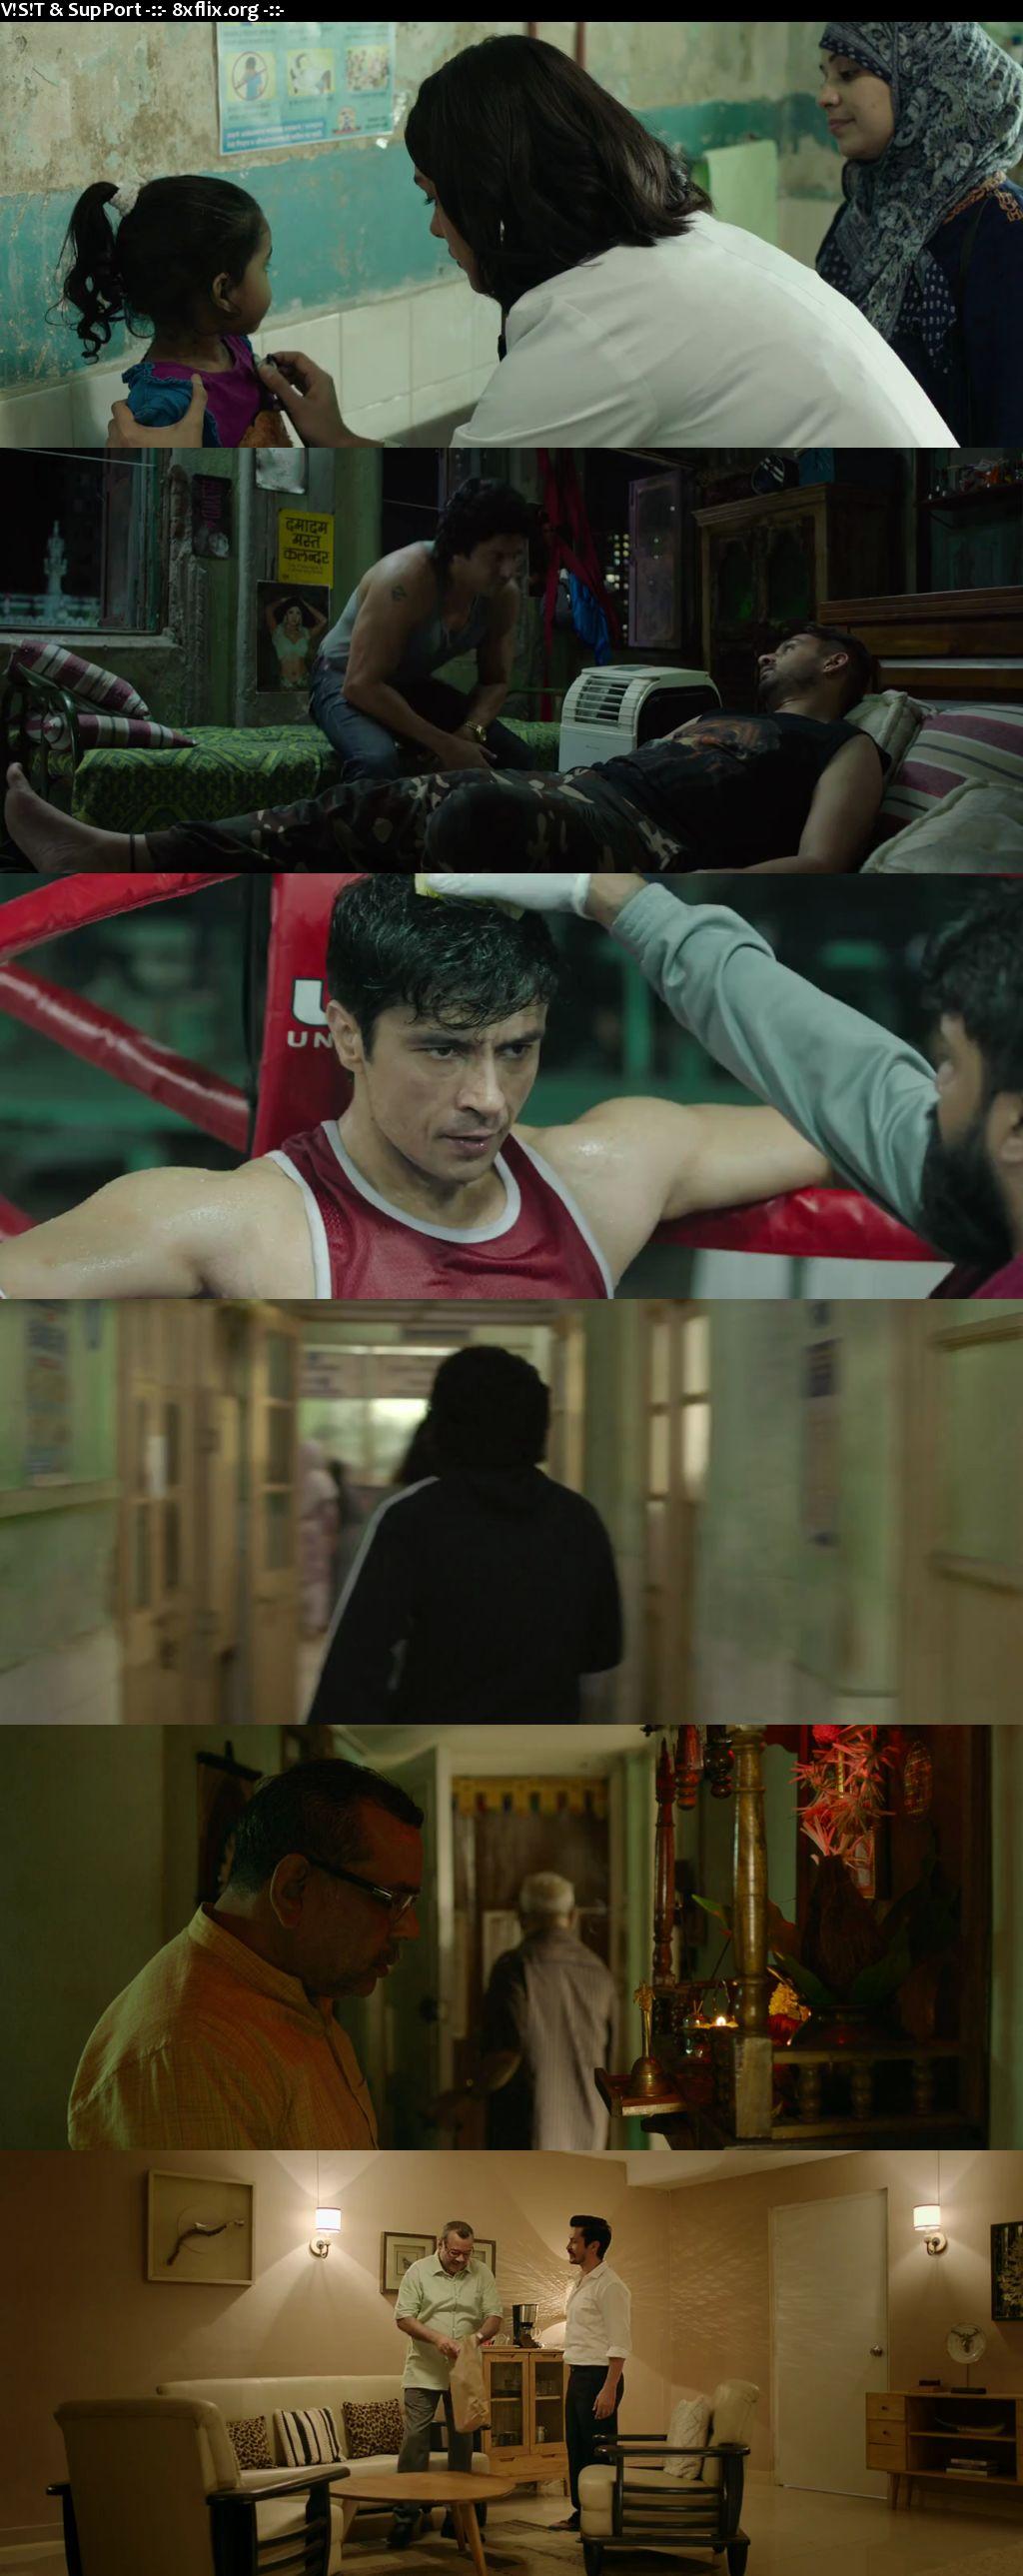 Toofaan 2021 Full Hindi Movie Download 720p 480p Web-DL HD